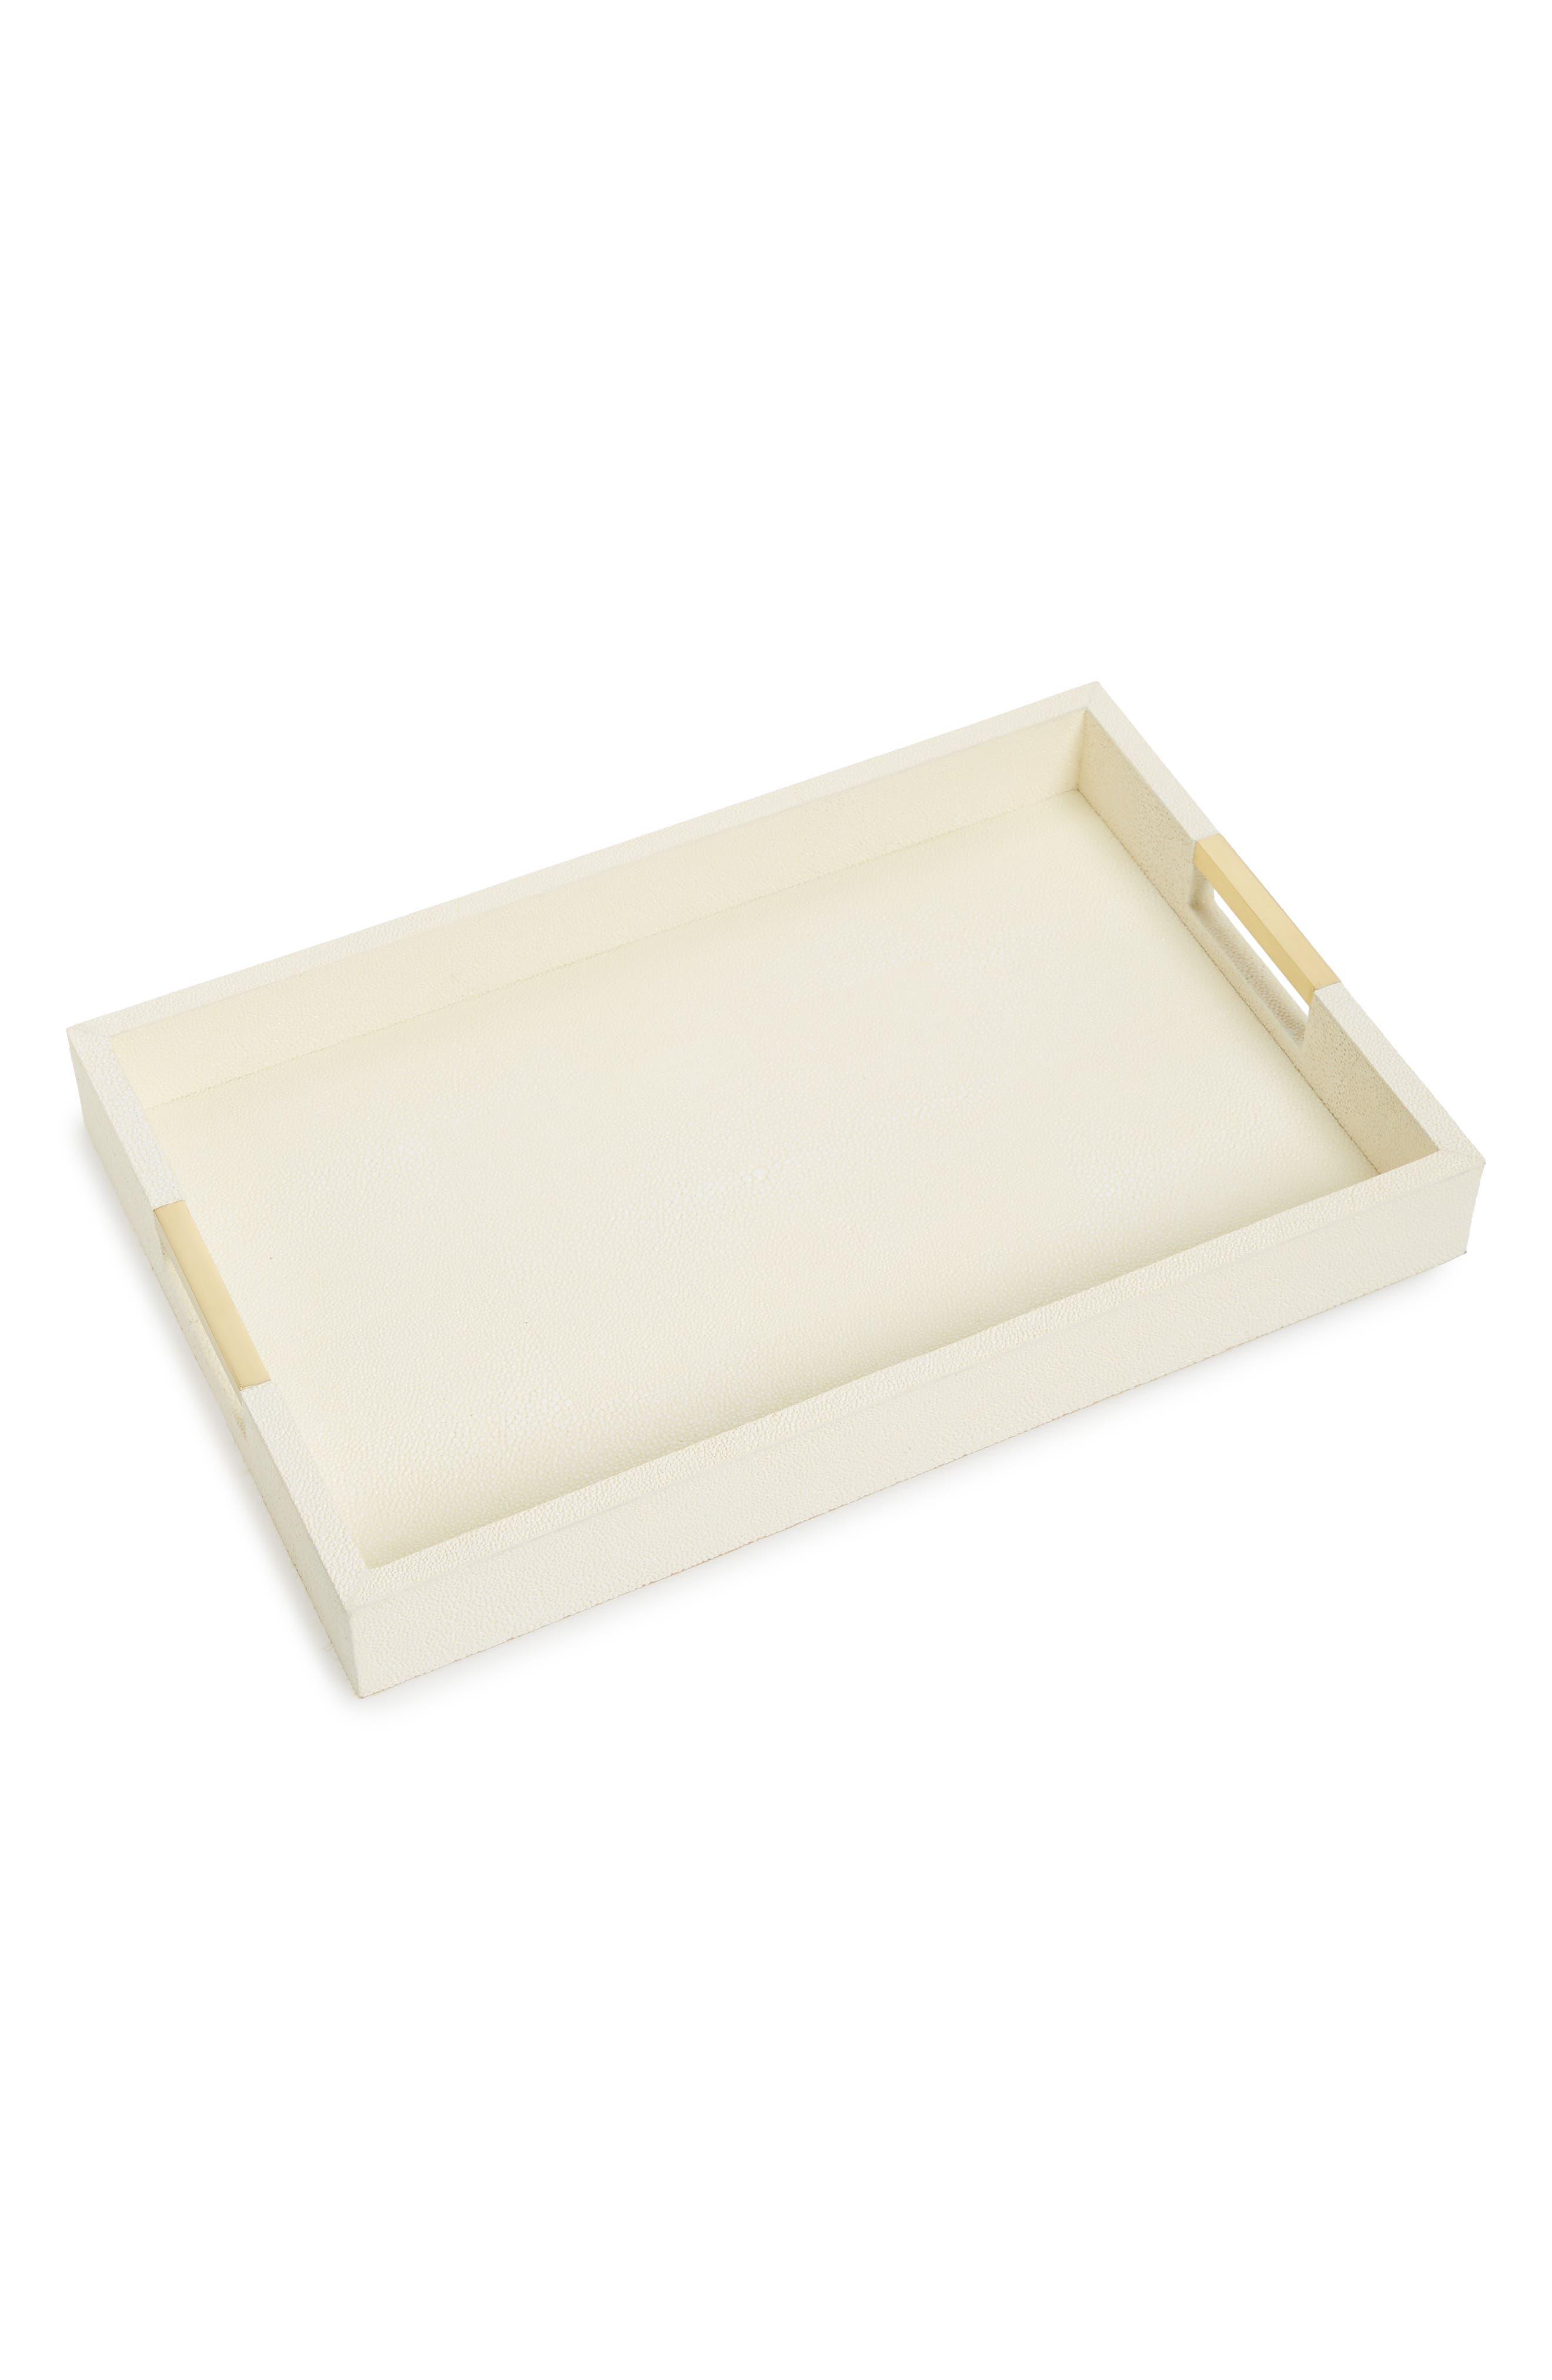 Modern Shagreen Desk Tray,                             Main thumbnail 1, color,                             Ivory Cream